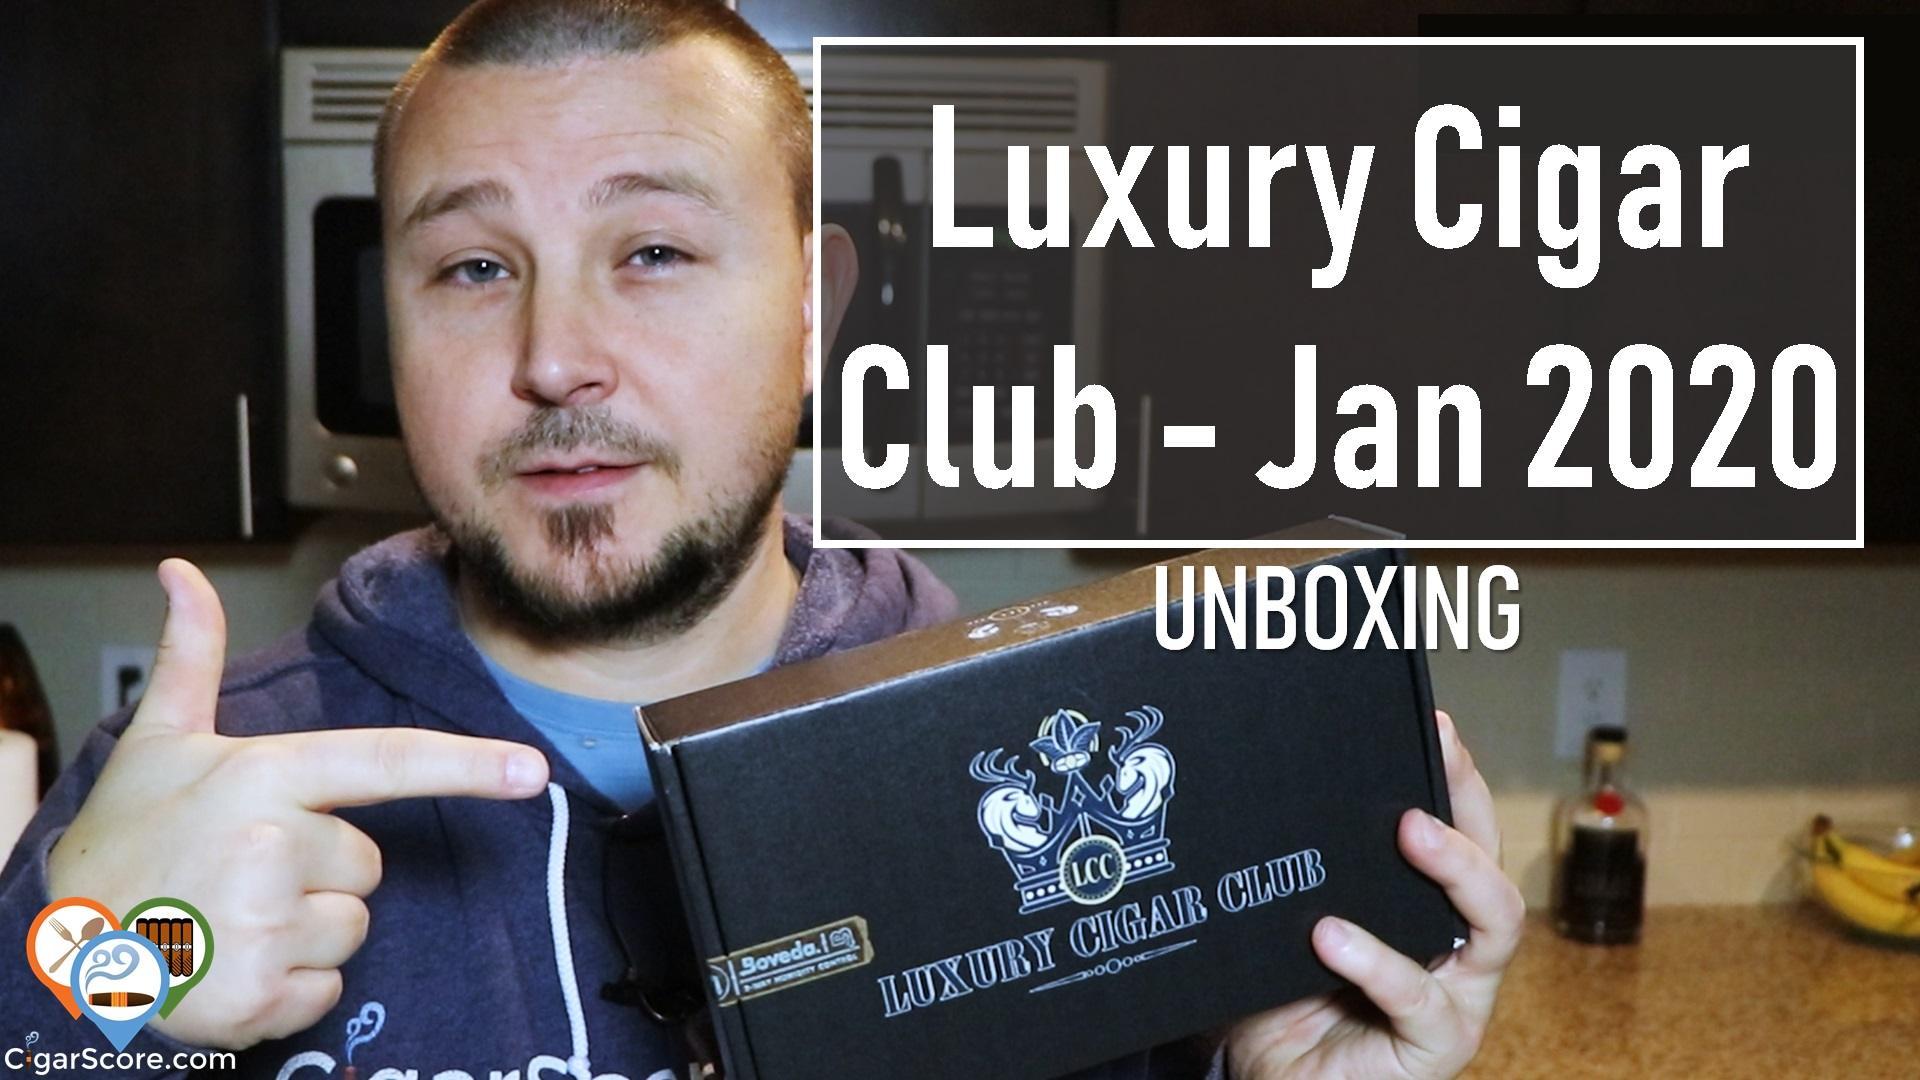 Unboxing - Luxury Cigar Club January 2020